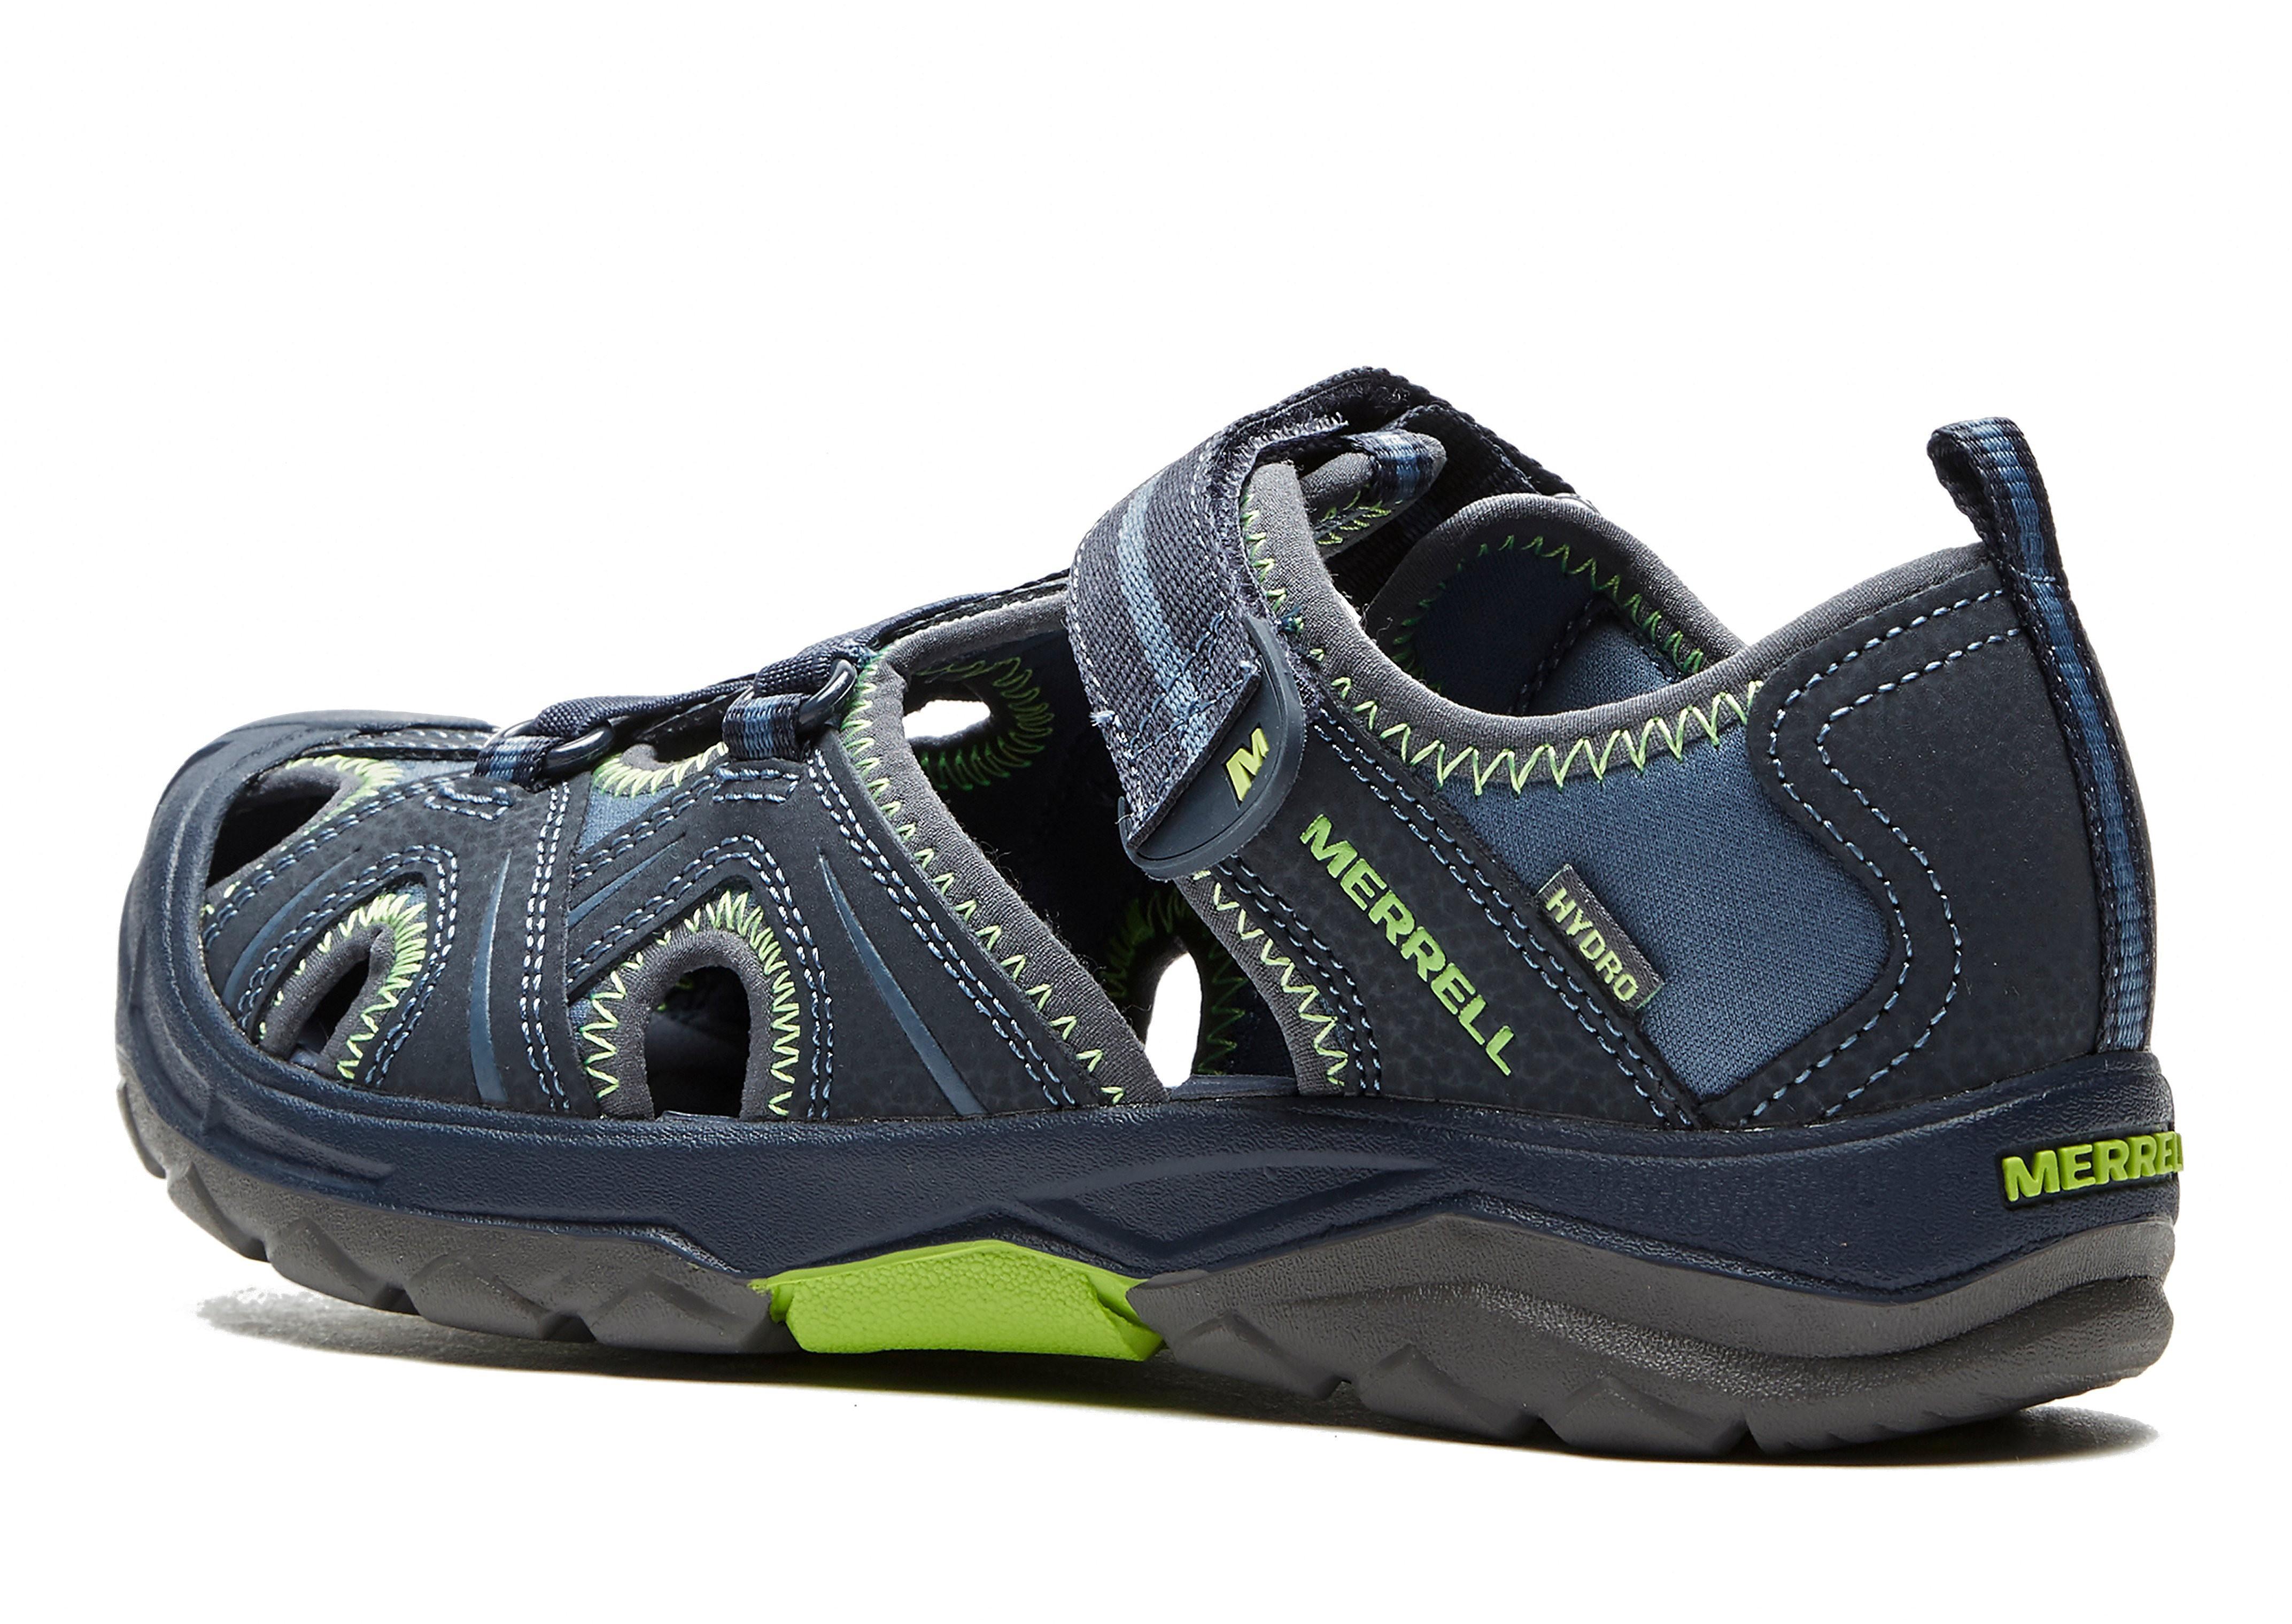 Merrell Hydro Hiker Sandals Junior